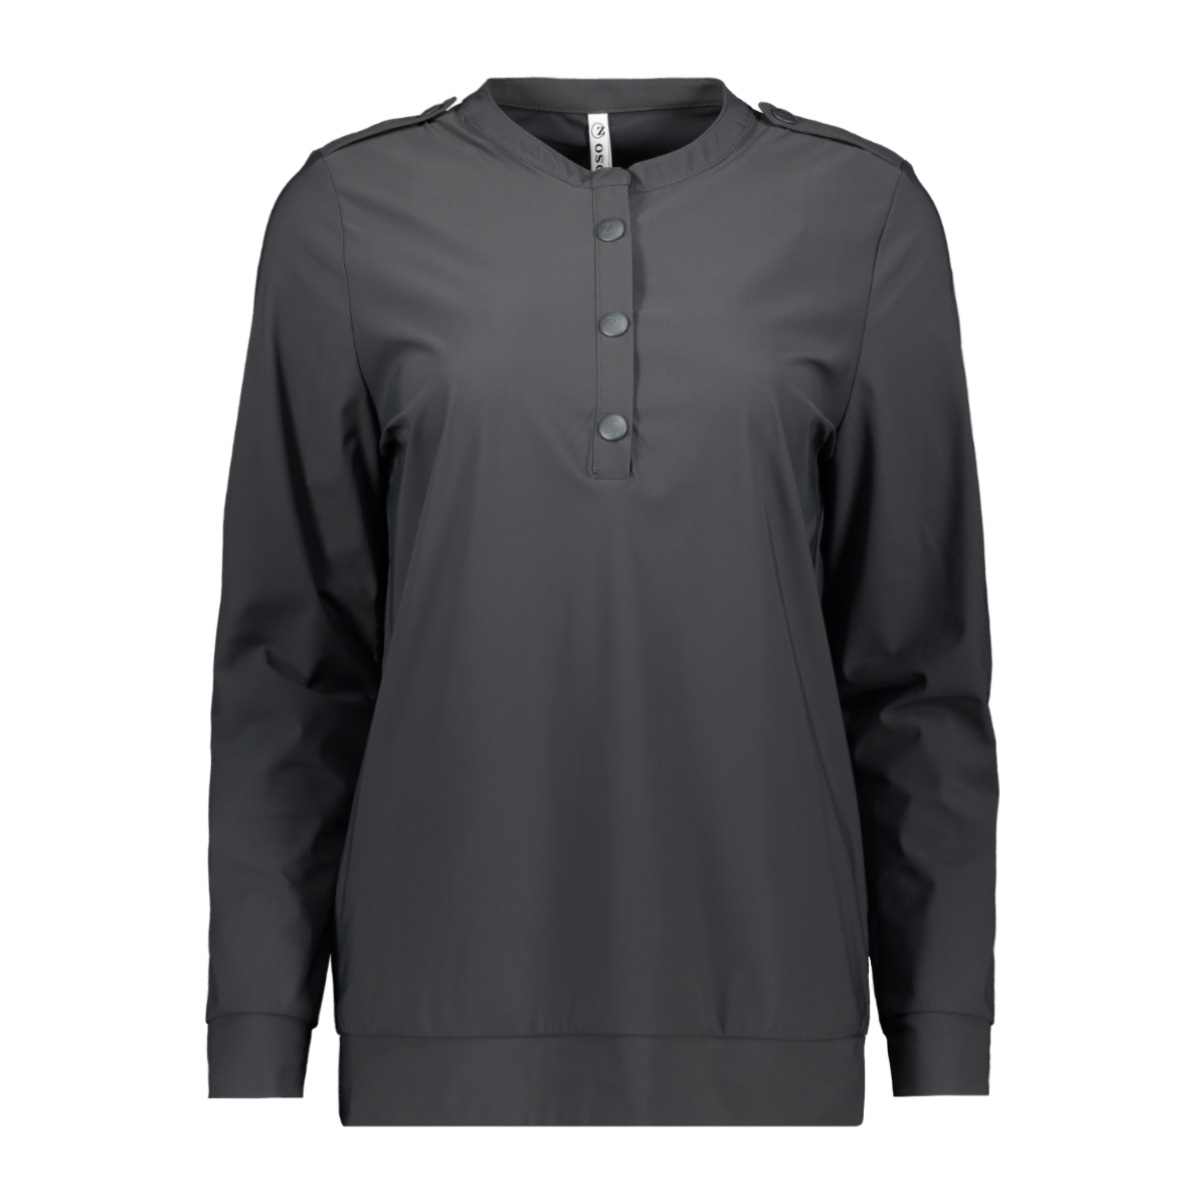 marlies travel blouse 201 zoso blouse 0059 charcoal